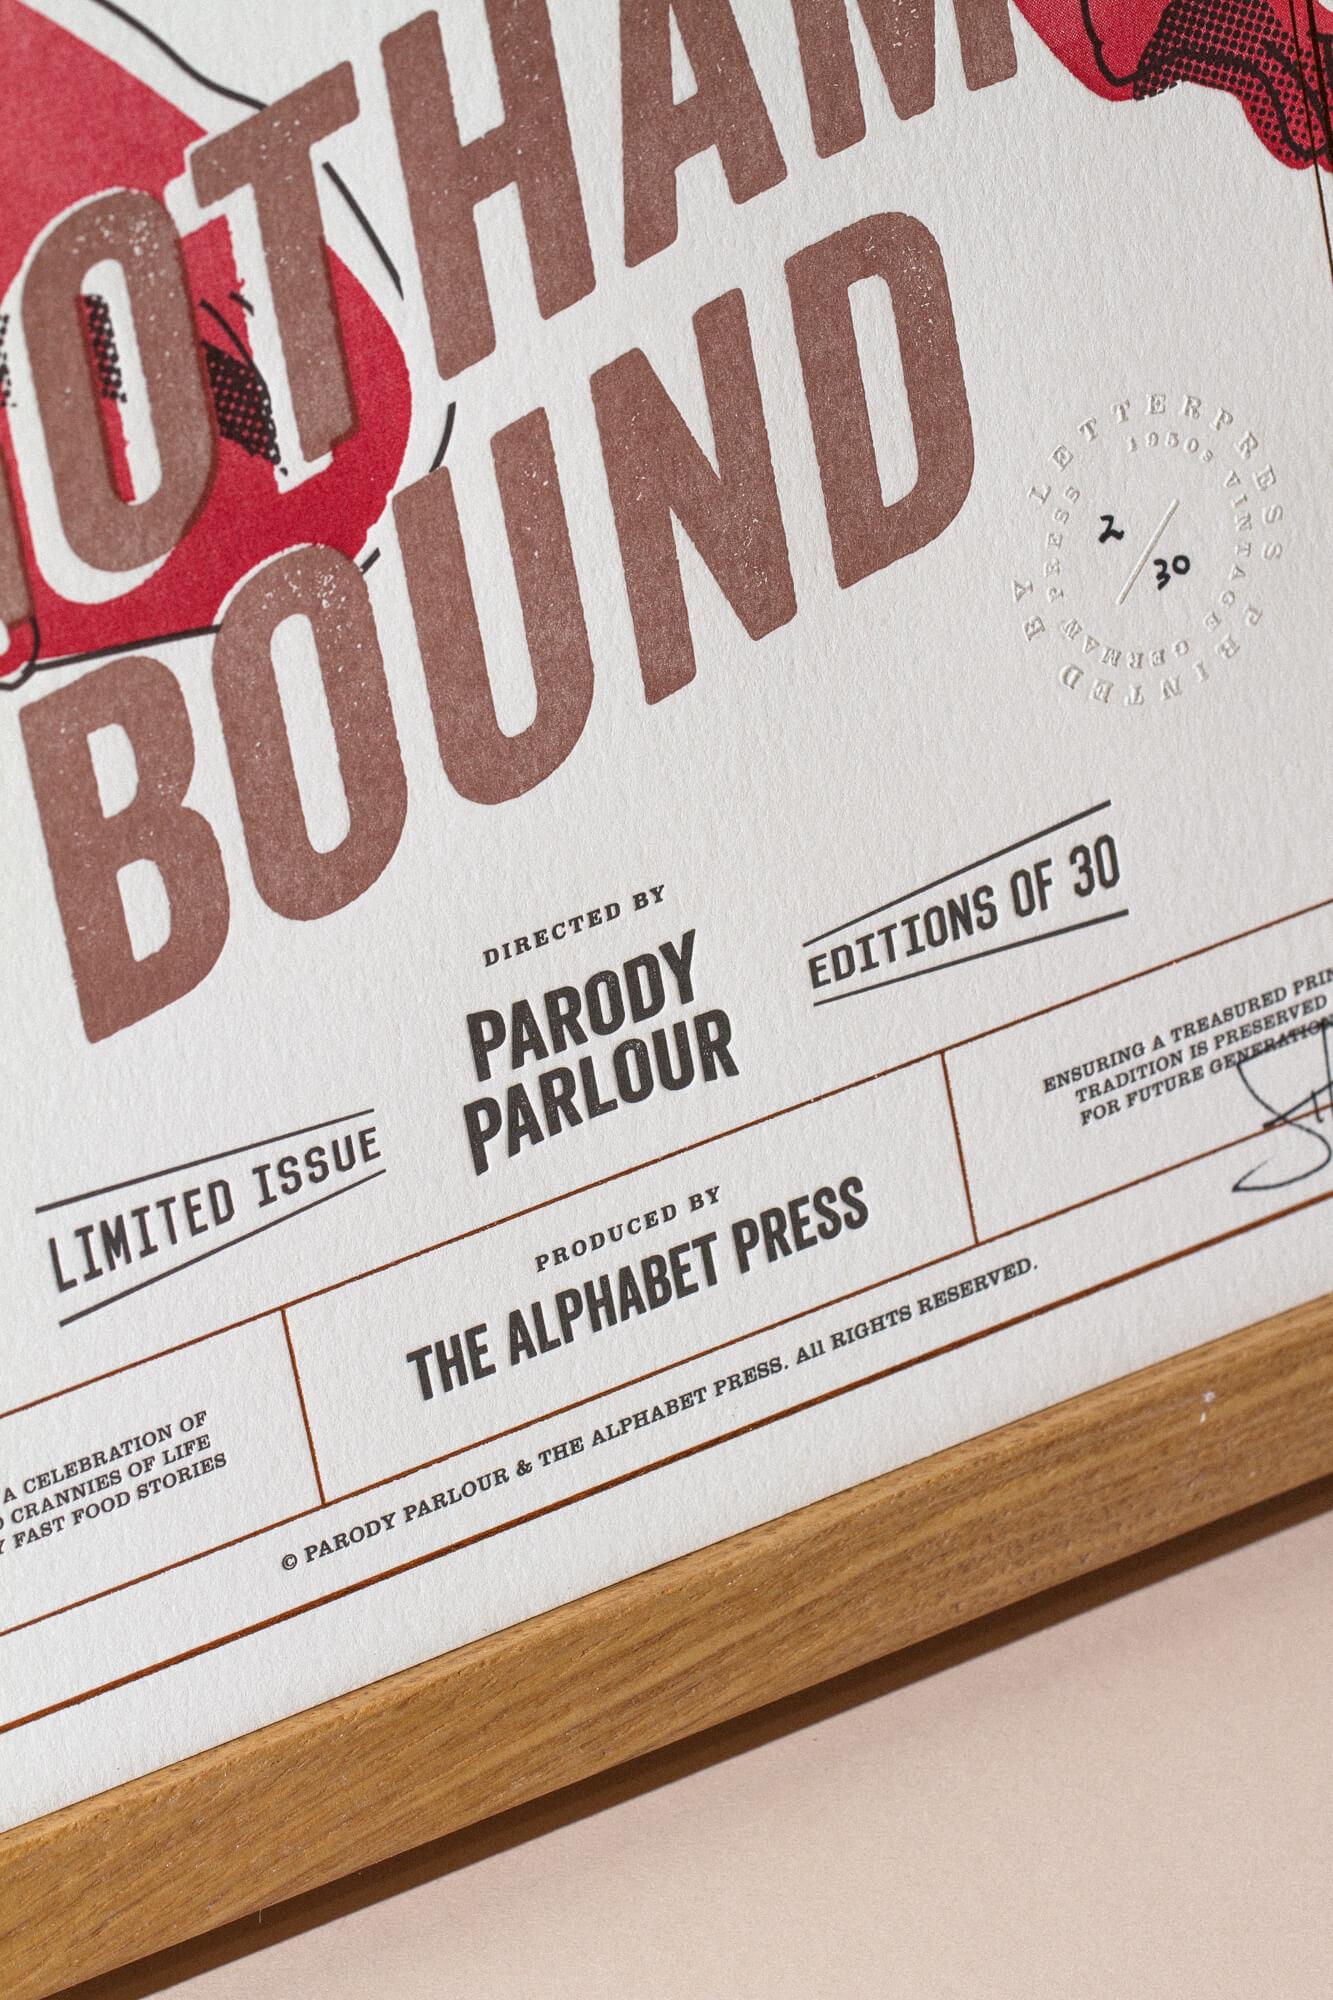 The Alphabet Press x Parody Parlour